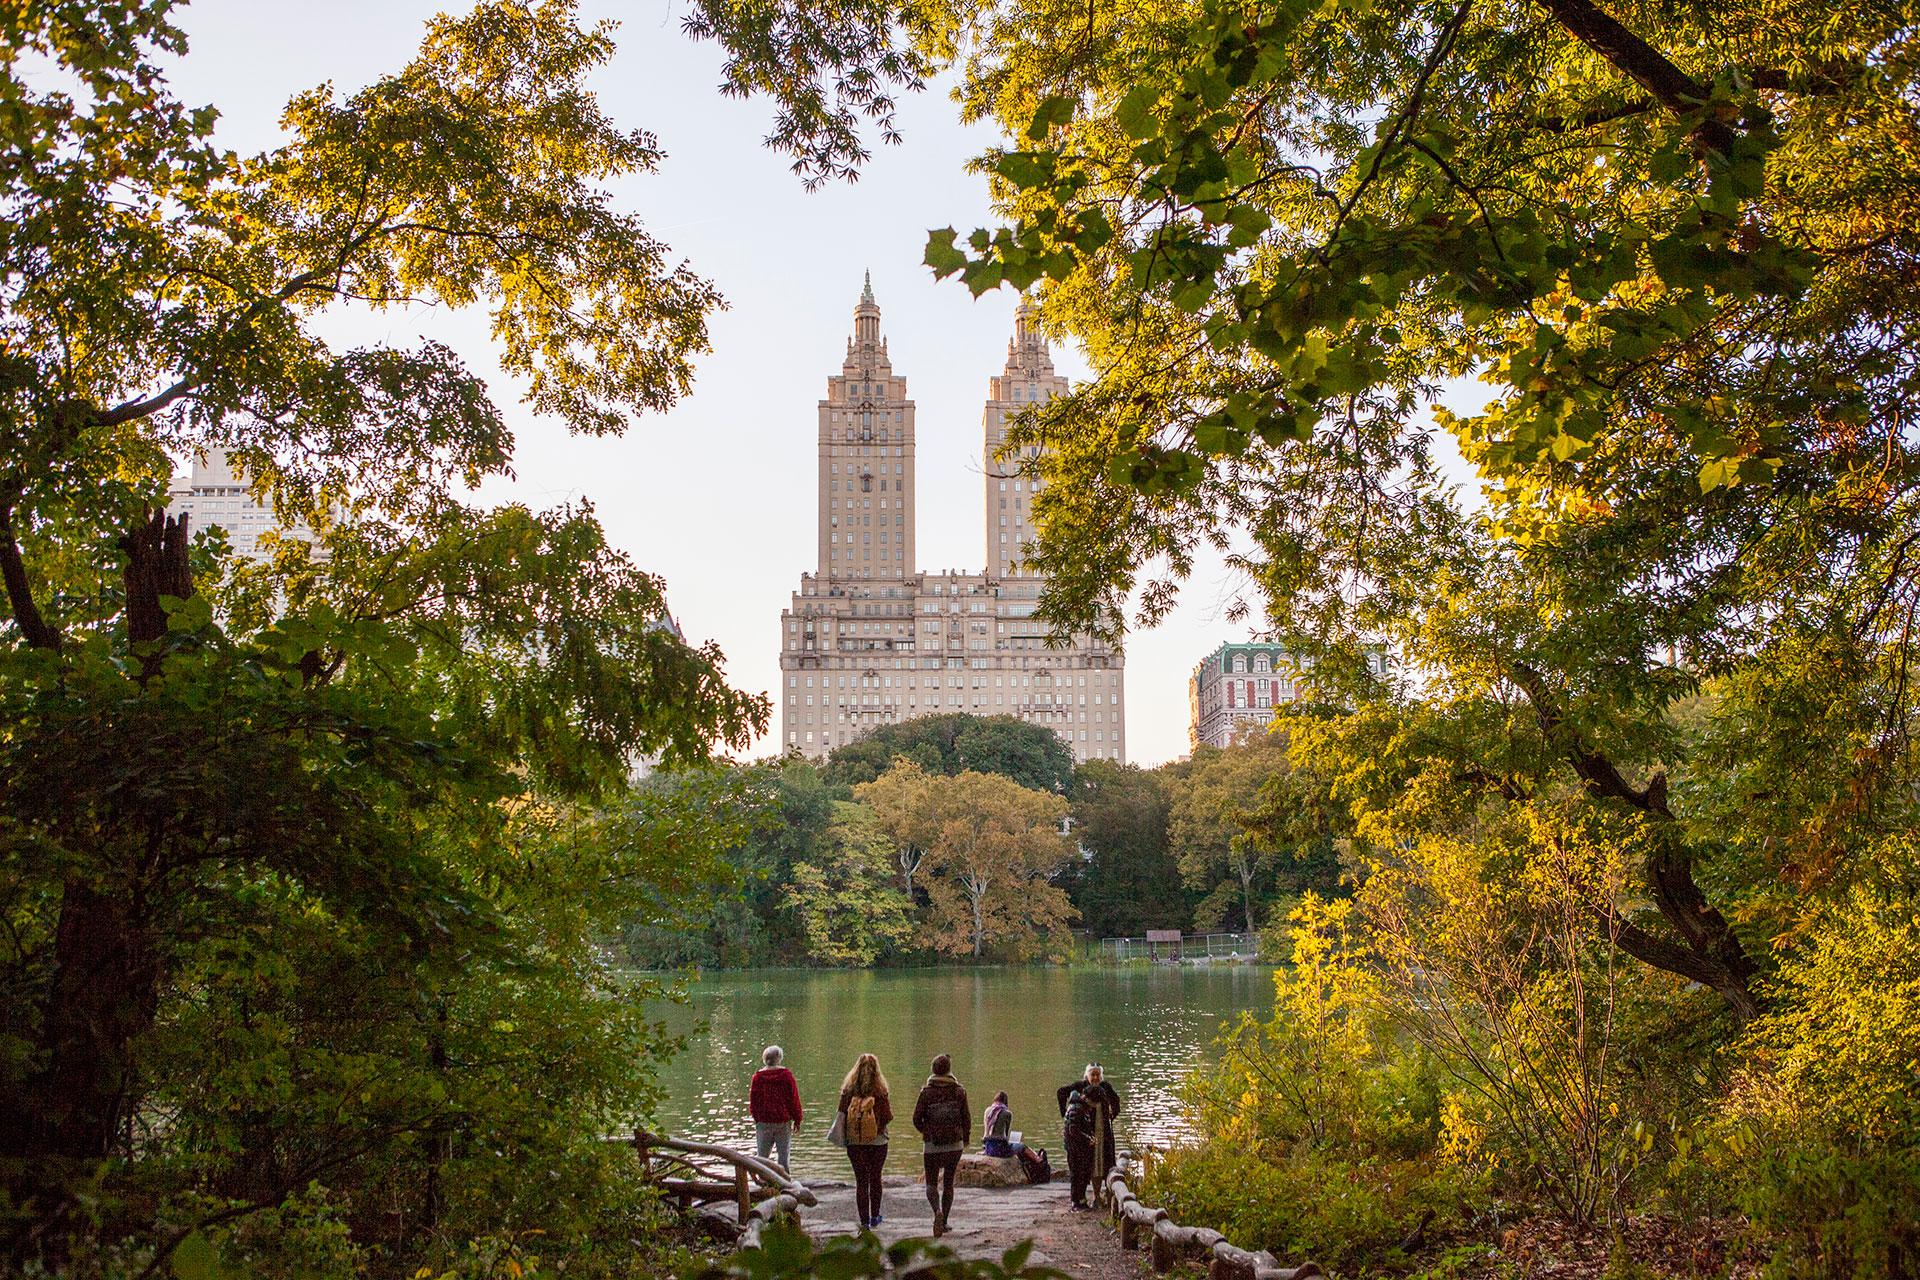 Central Park, New York; Courtesy of Christopher Postlewaite/NYCGo.com